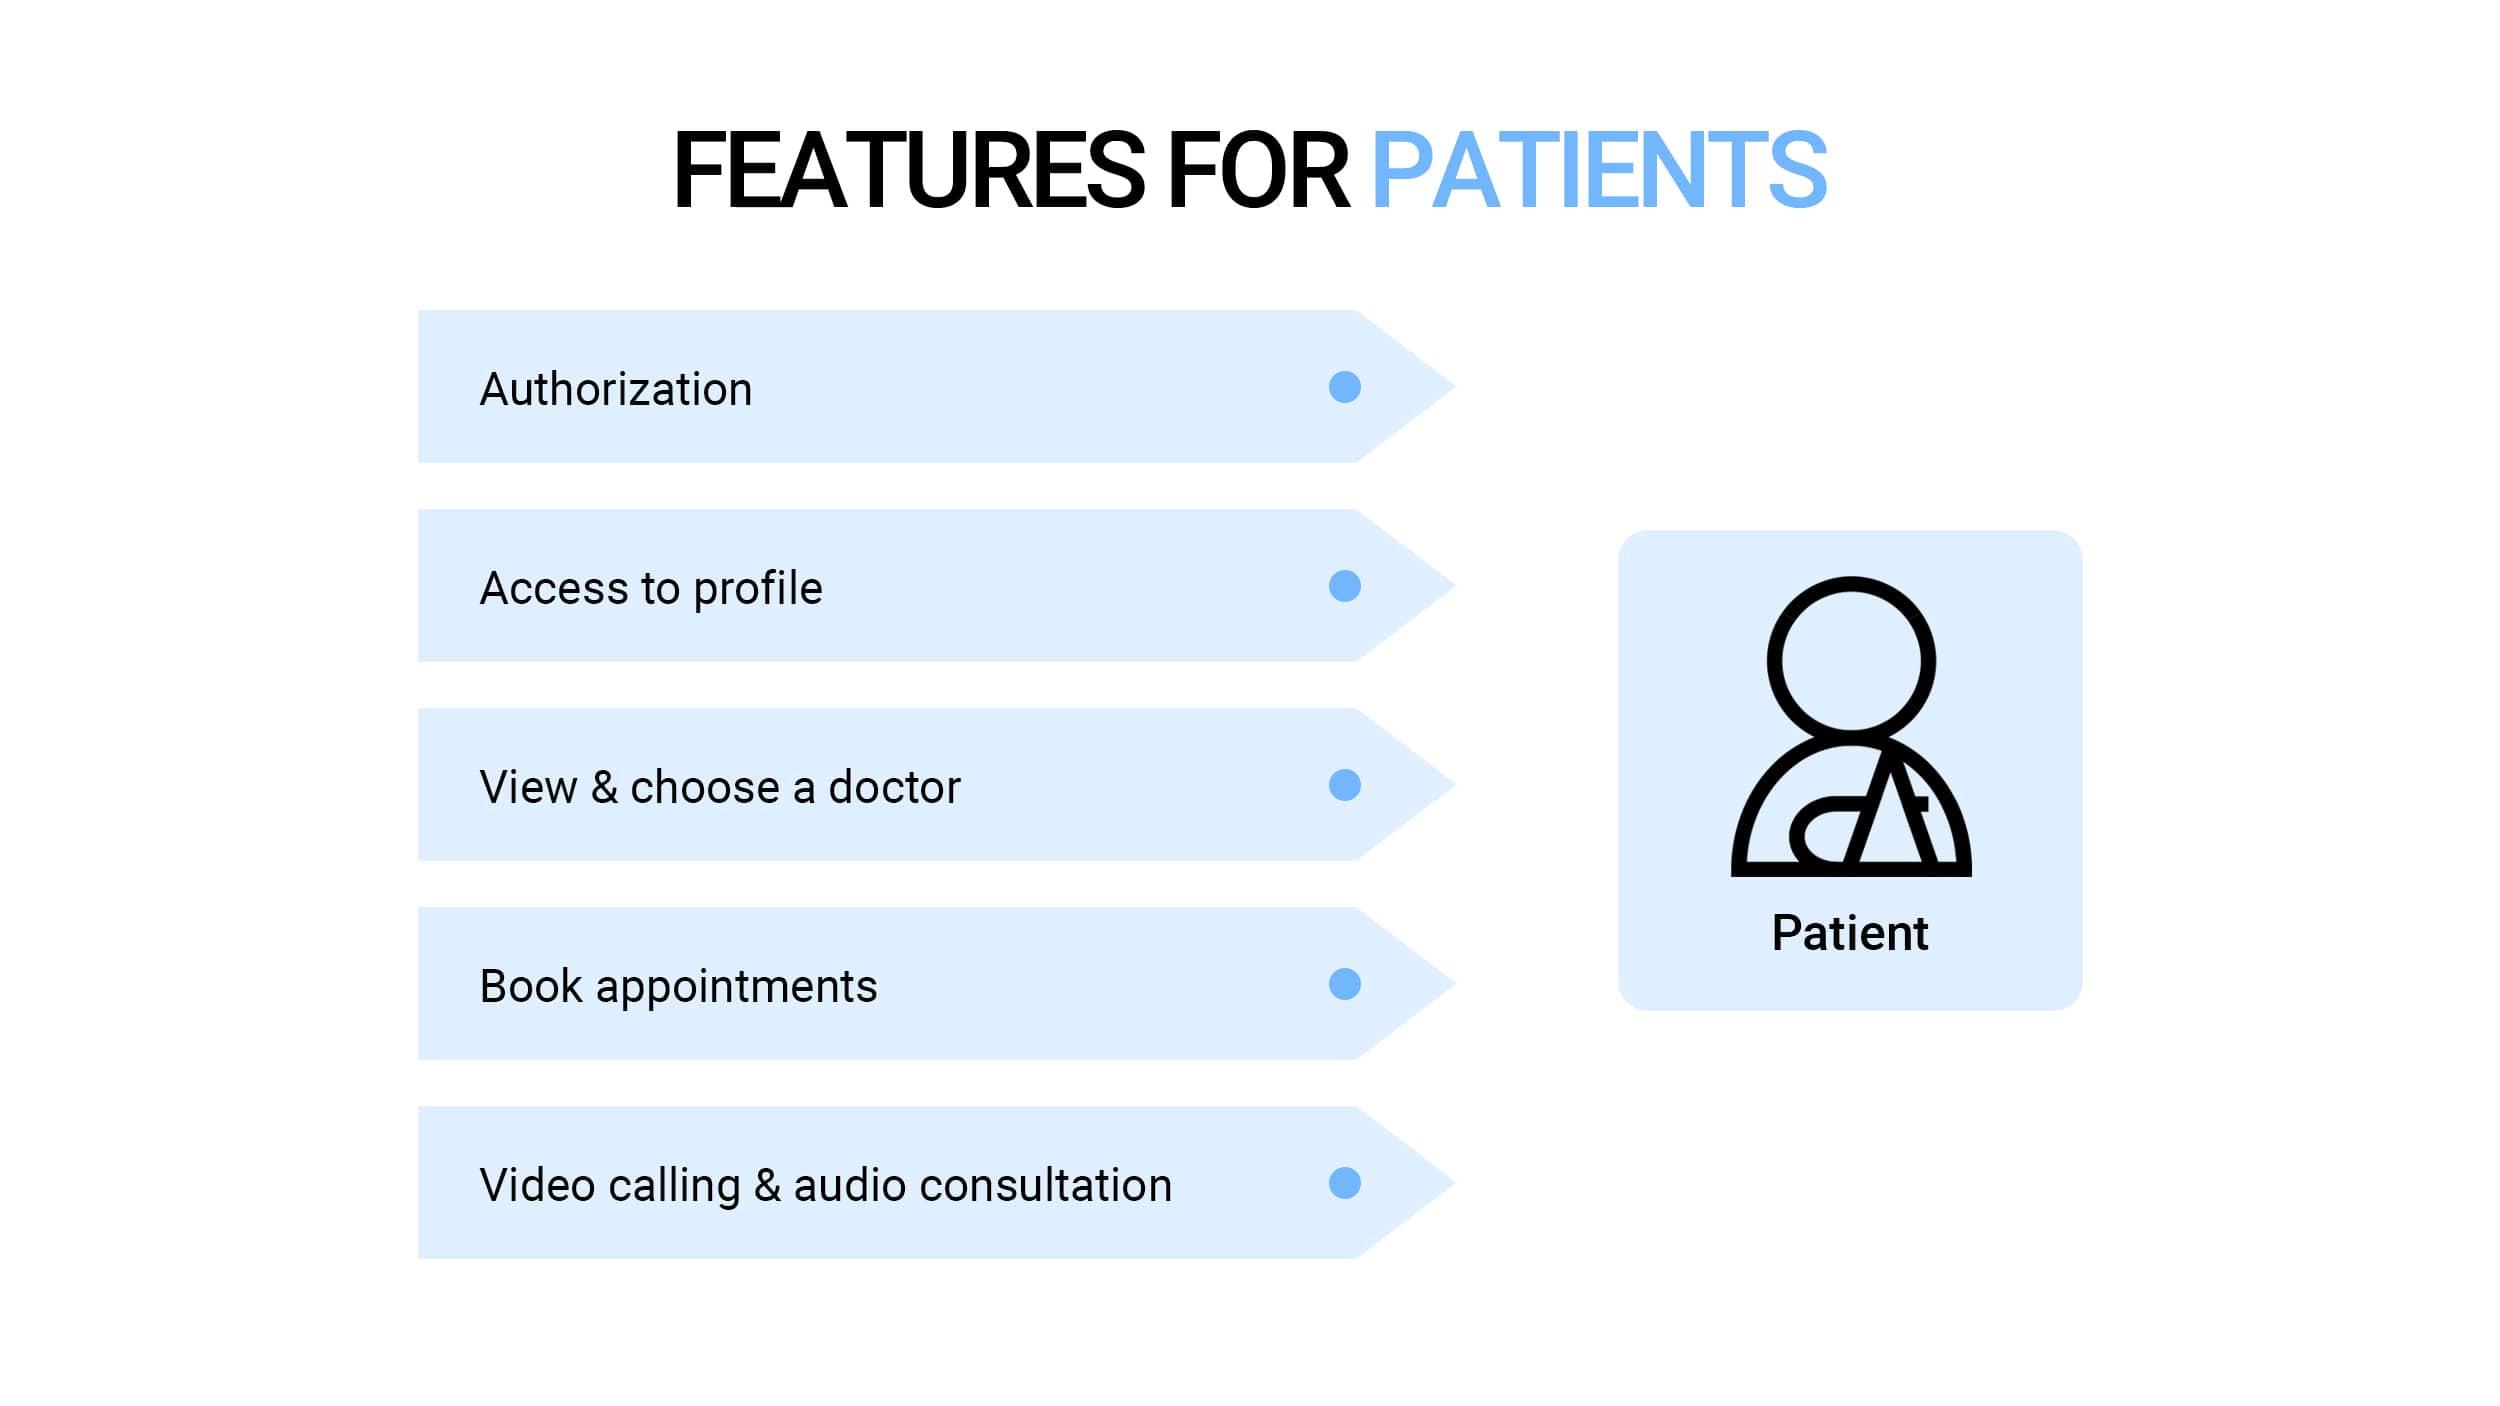 Telemedicine App Features for patients